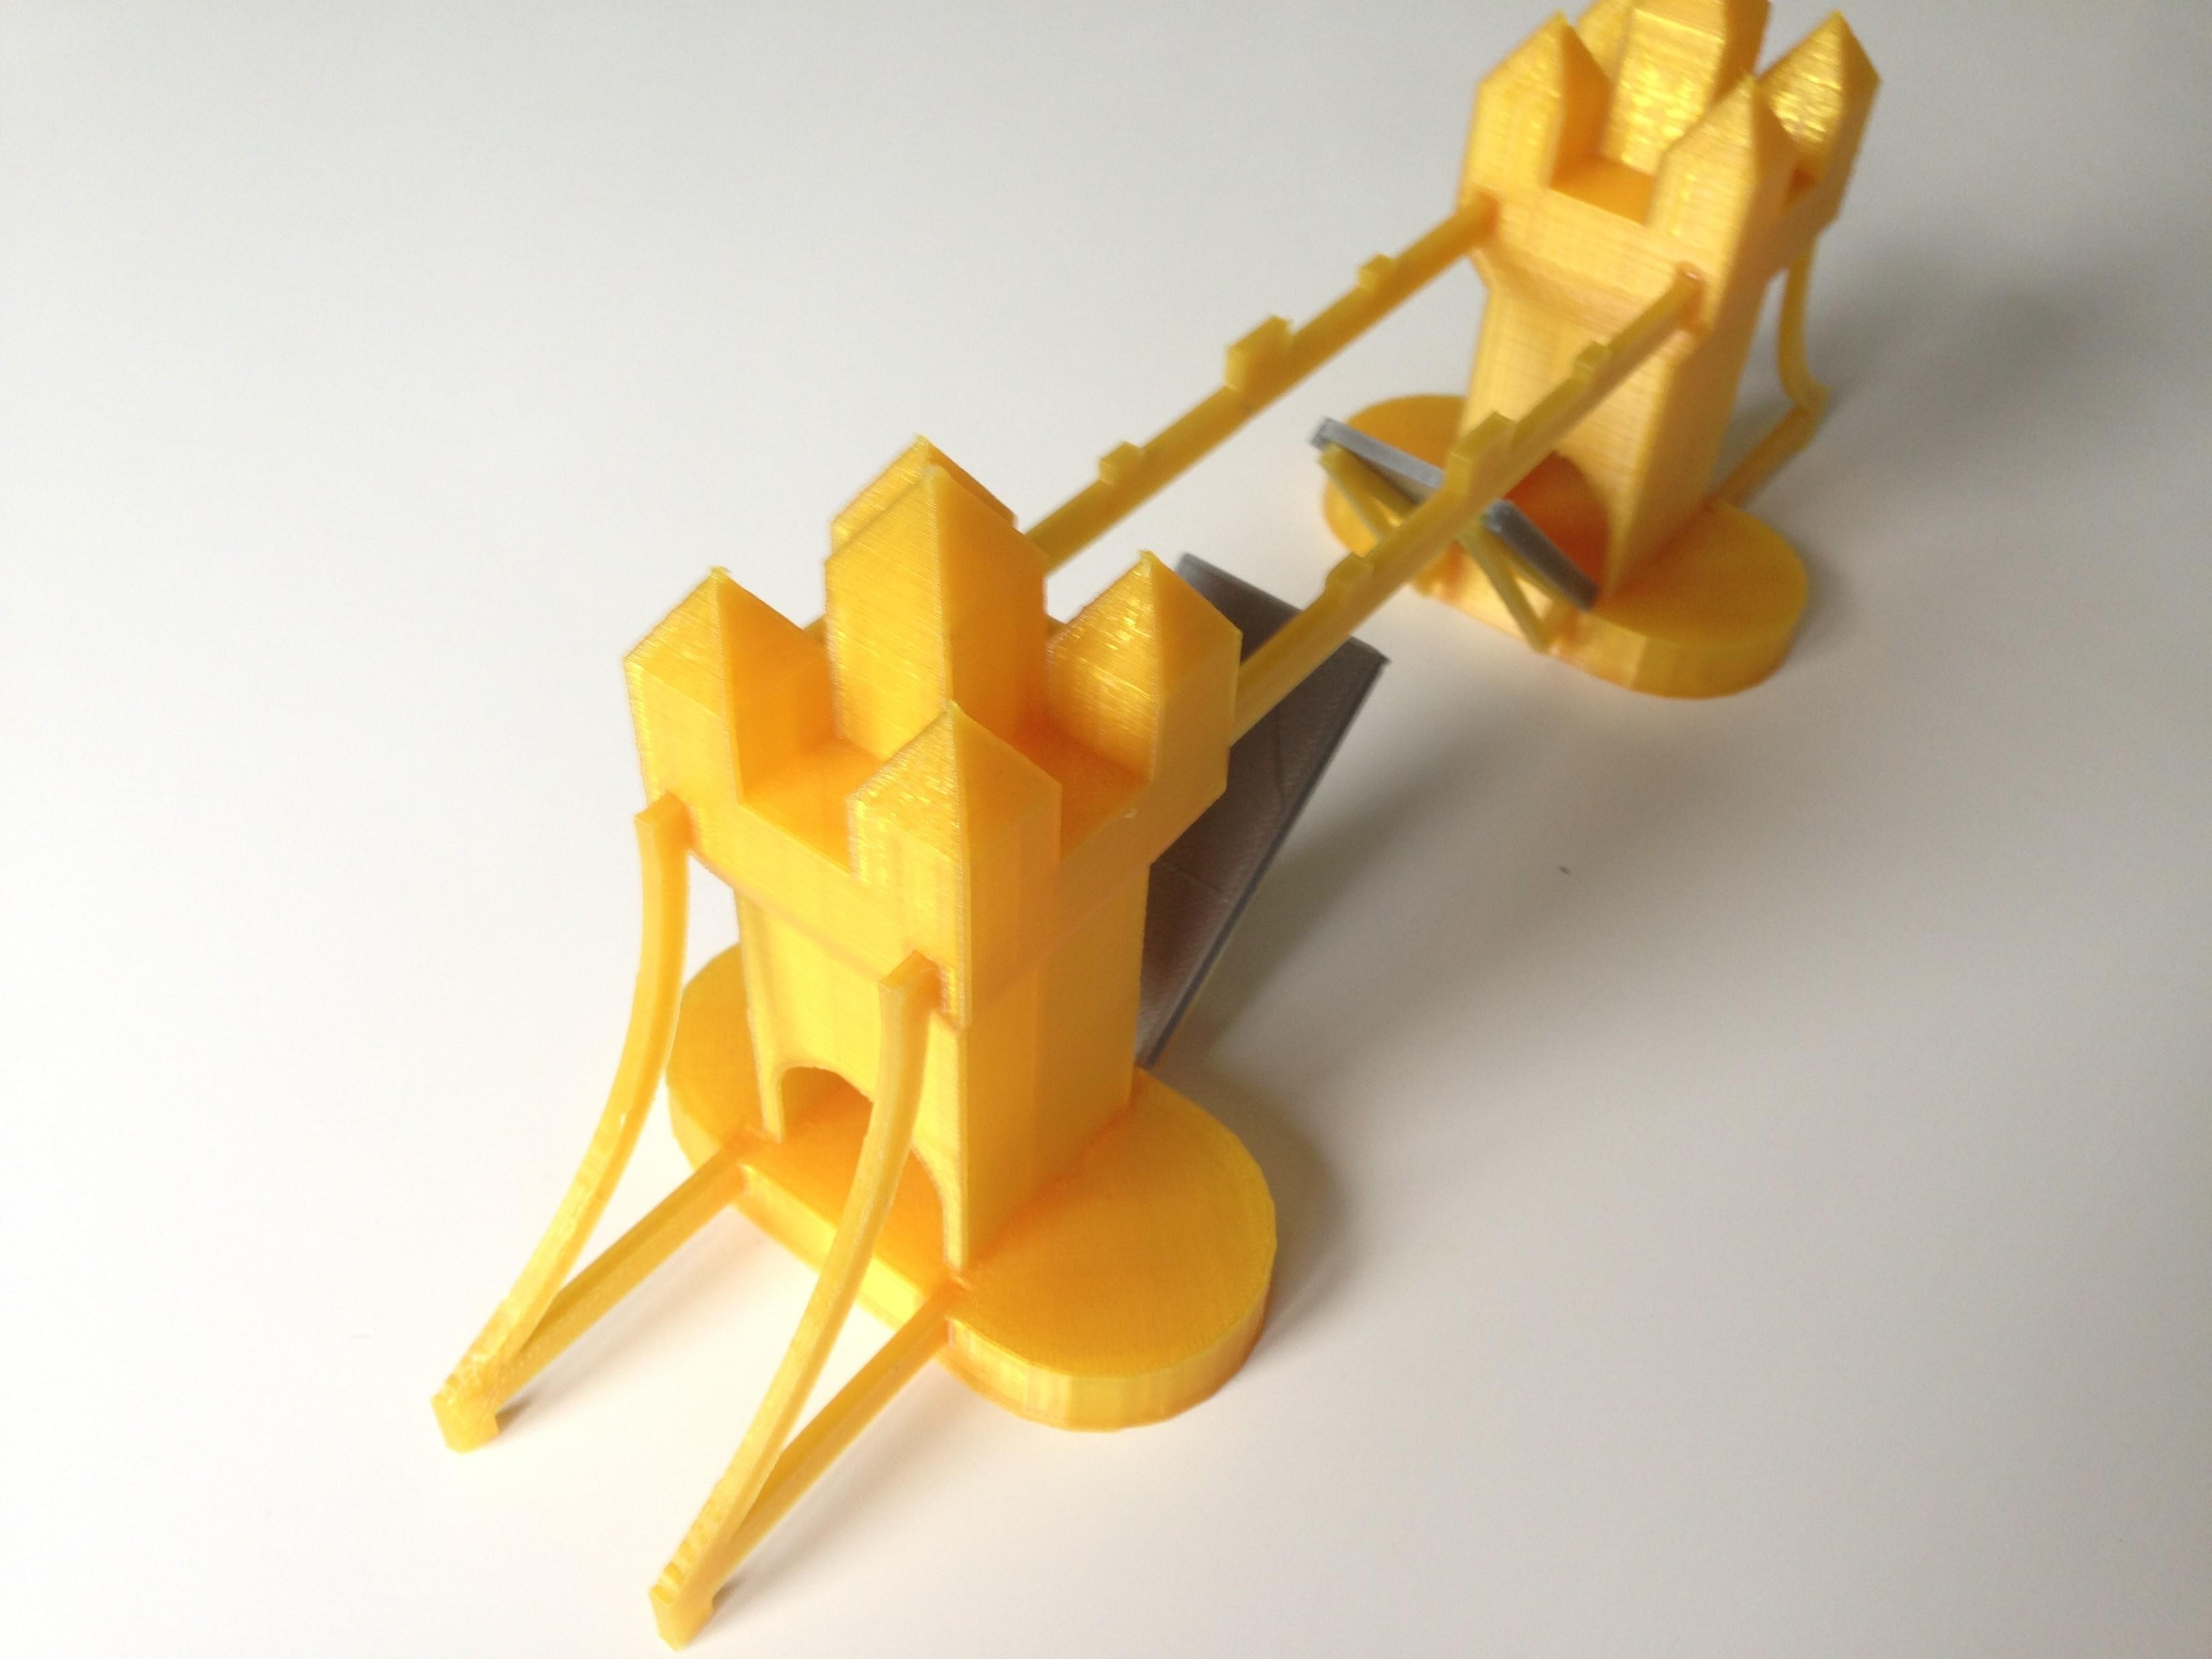 IMG_2668.JPG Download free STL file Tower Bridge Tower Bridge • 3D printing template, harps